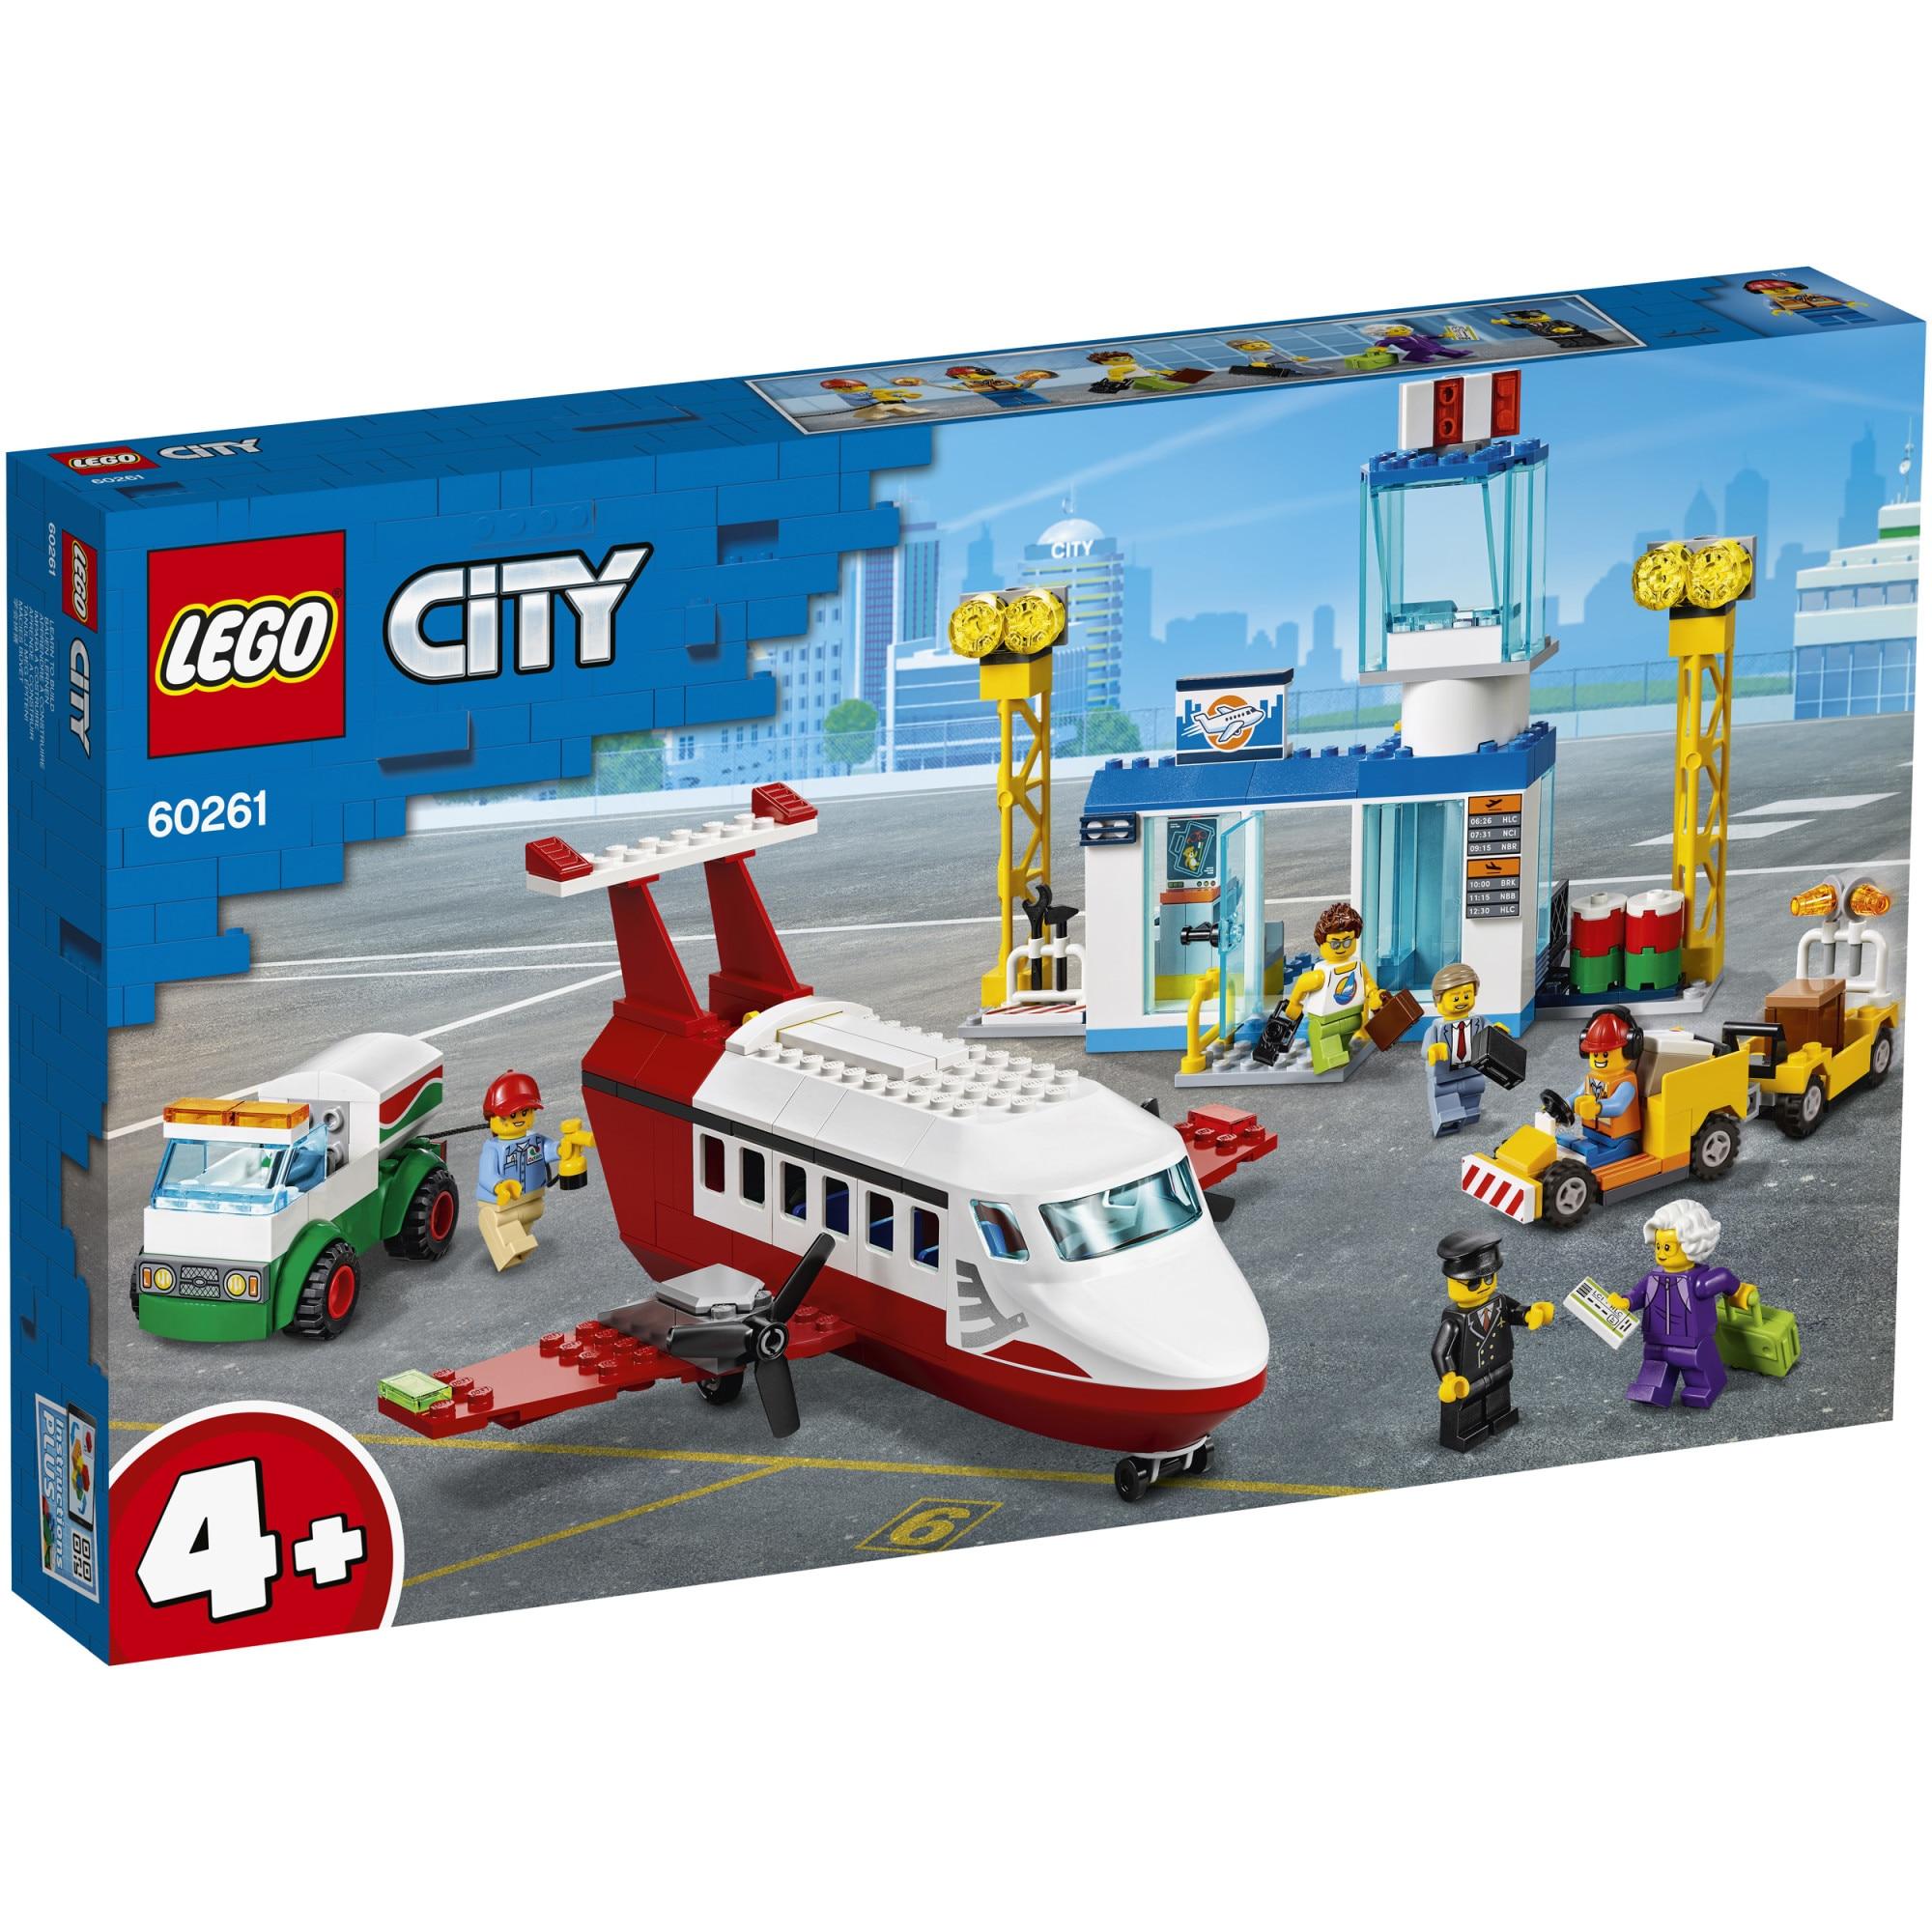 Fotografie LEGO City - Aeroport central 60261, 286 piese